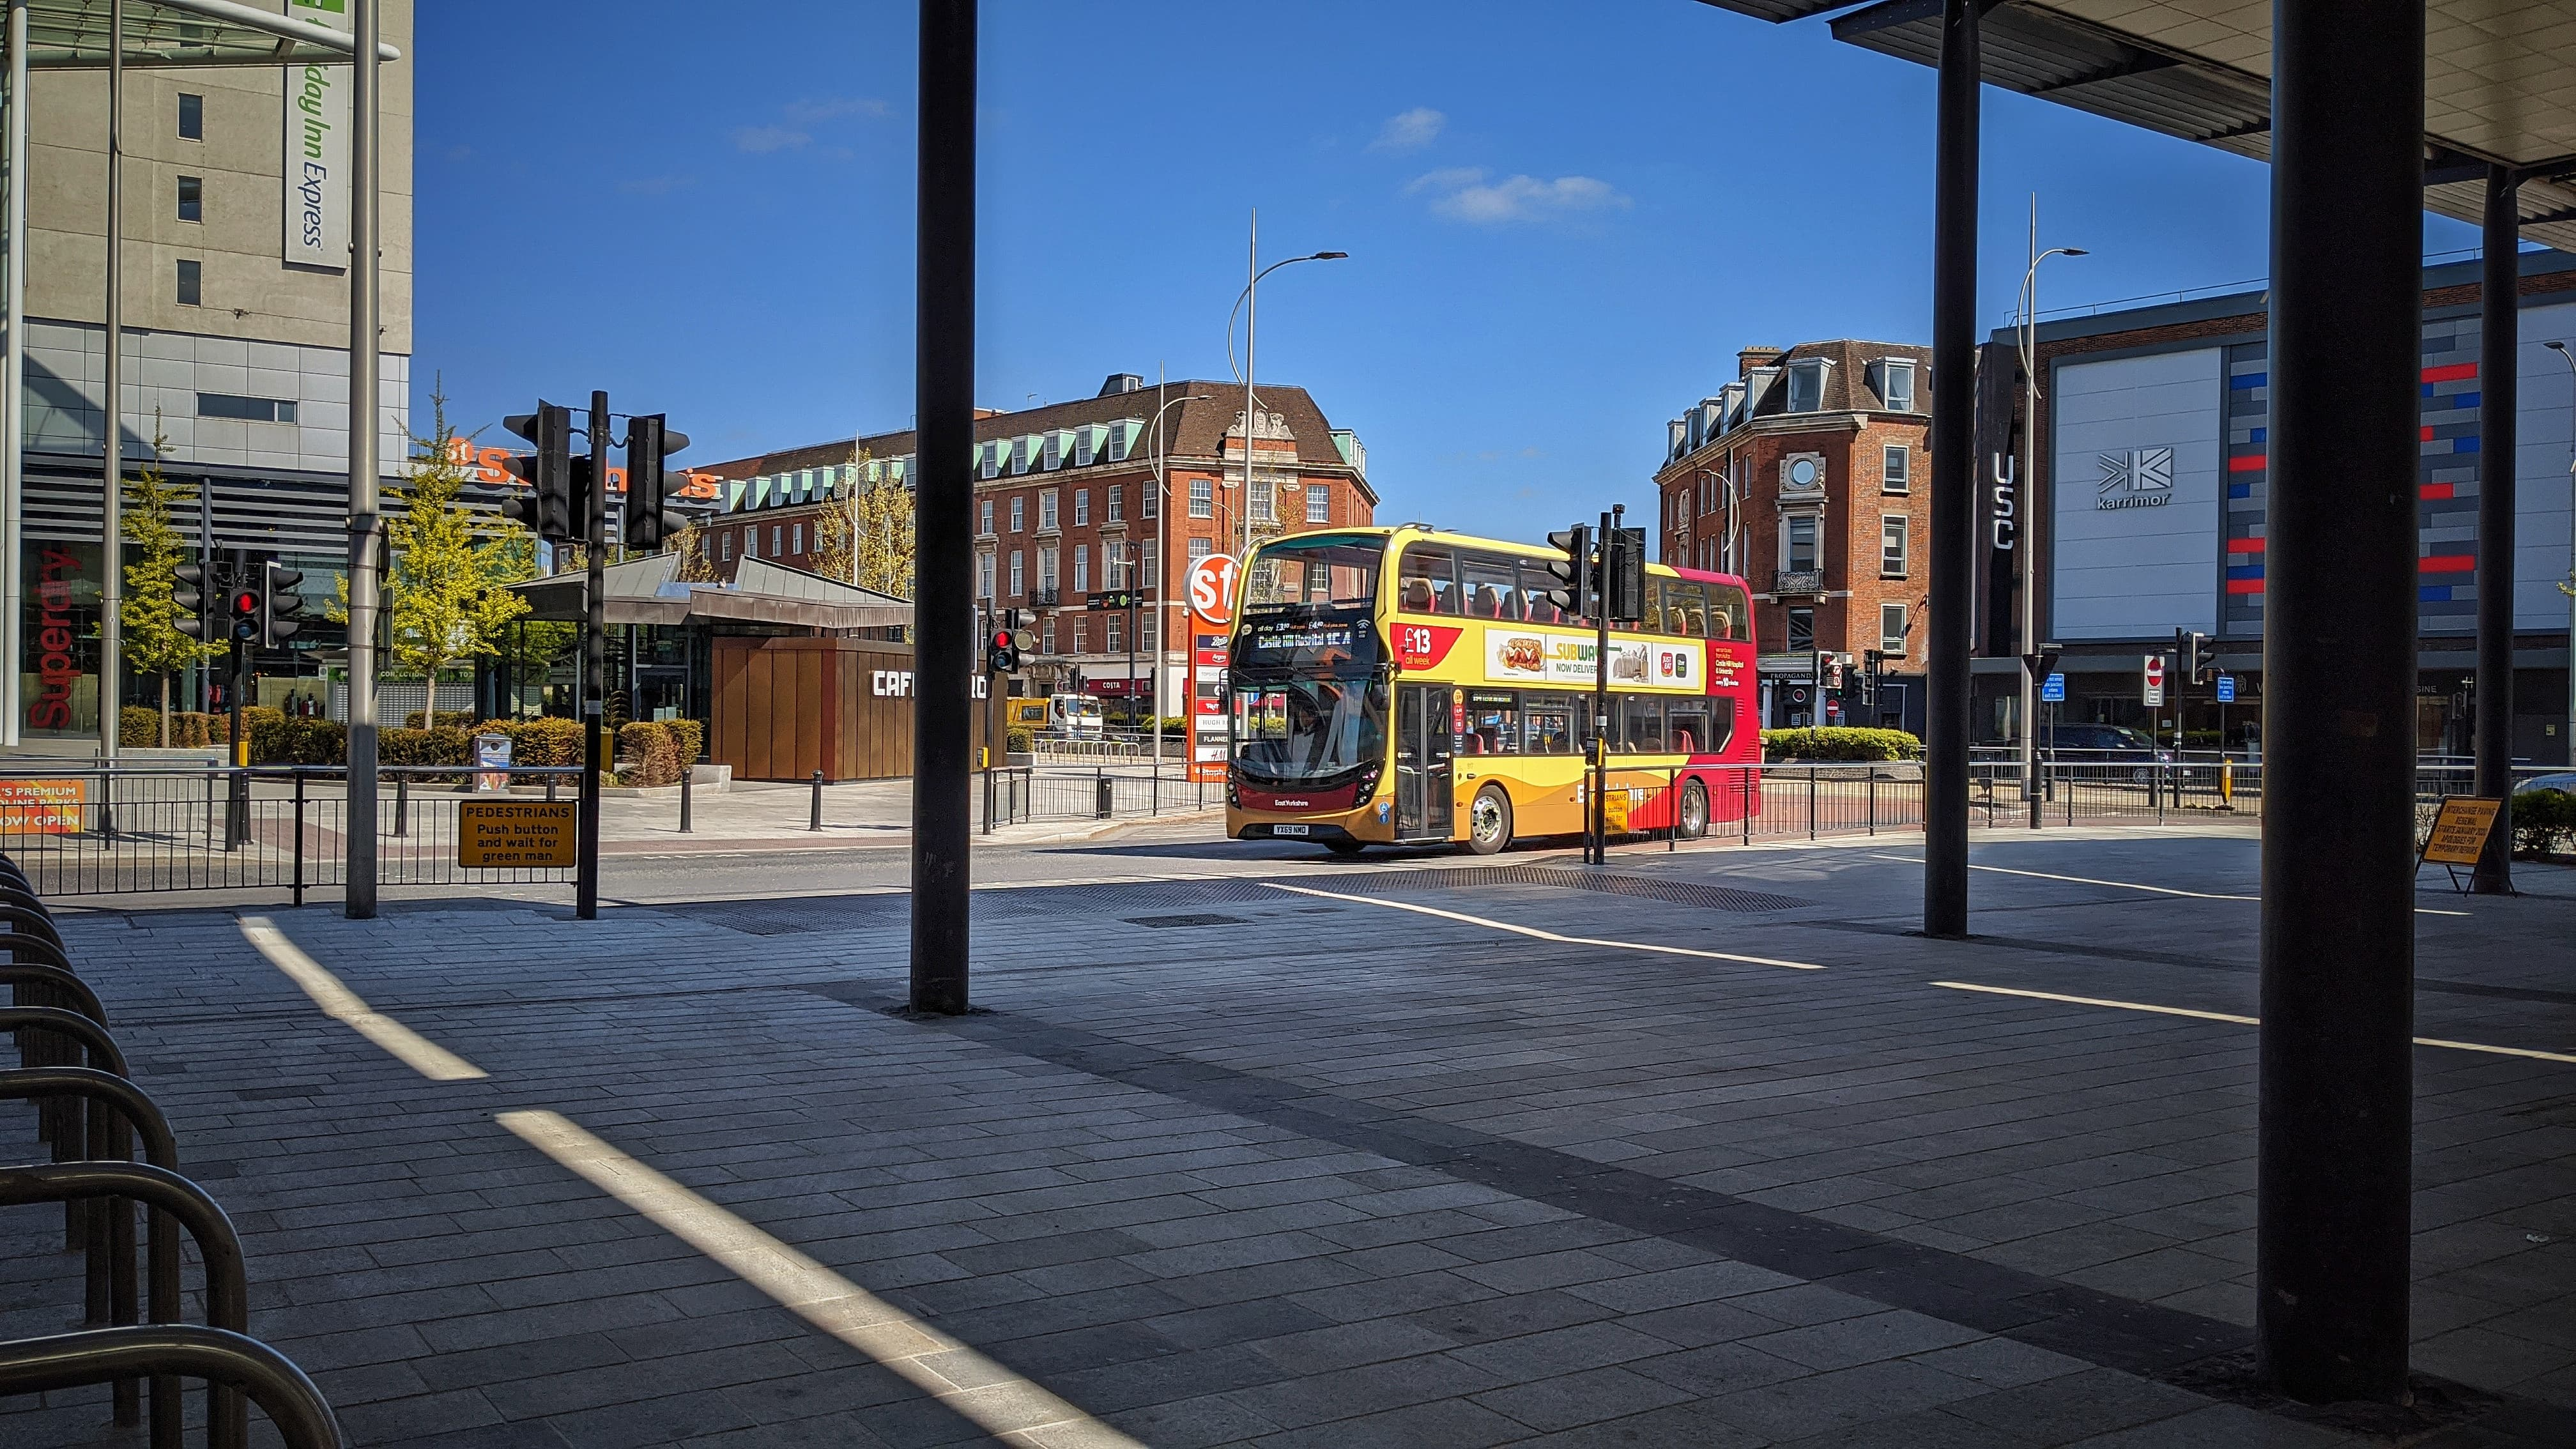 A double decker East Yorkshire bus drives into the Interchange